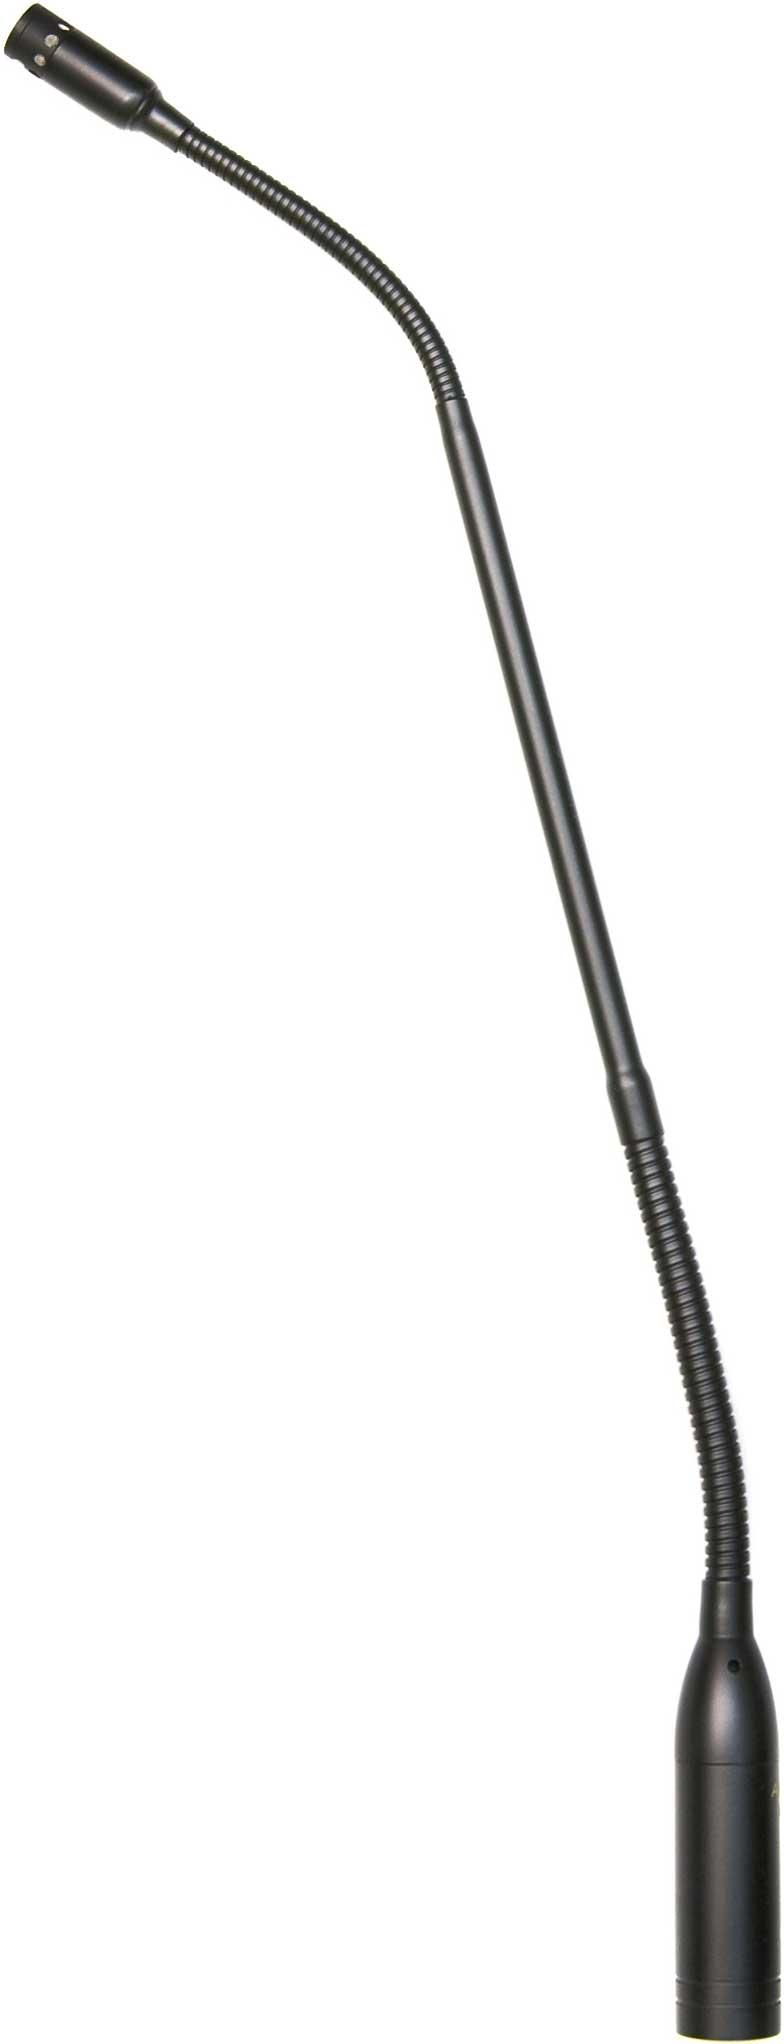 "Gooseneck Microphone, 12"", Cardioid, Condenser"